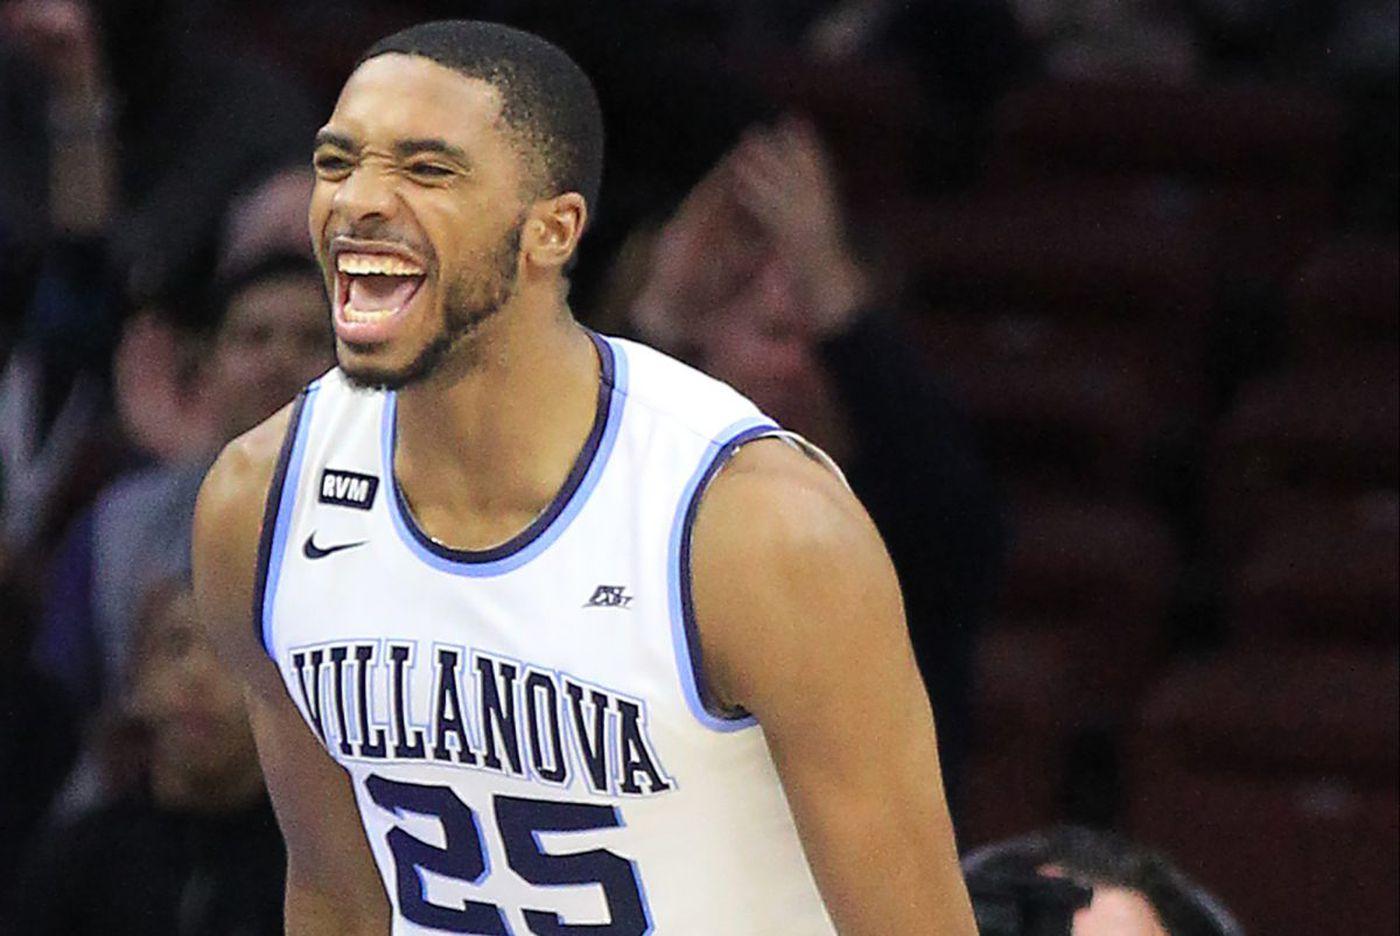 Villanova ends regular season with 97-73 win over Georgetown